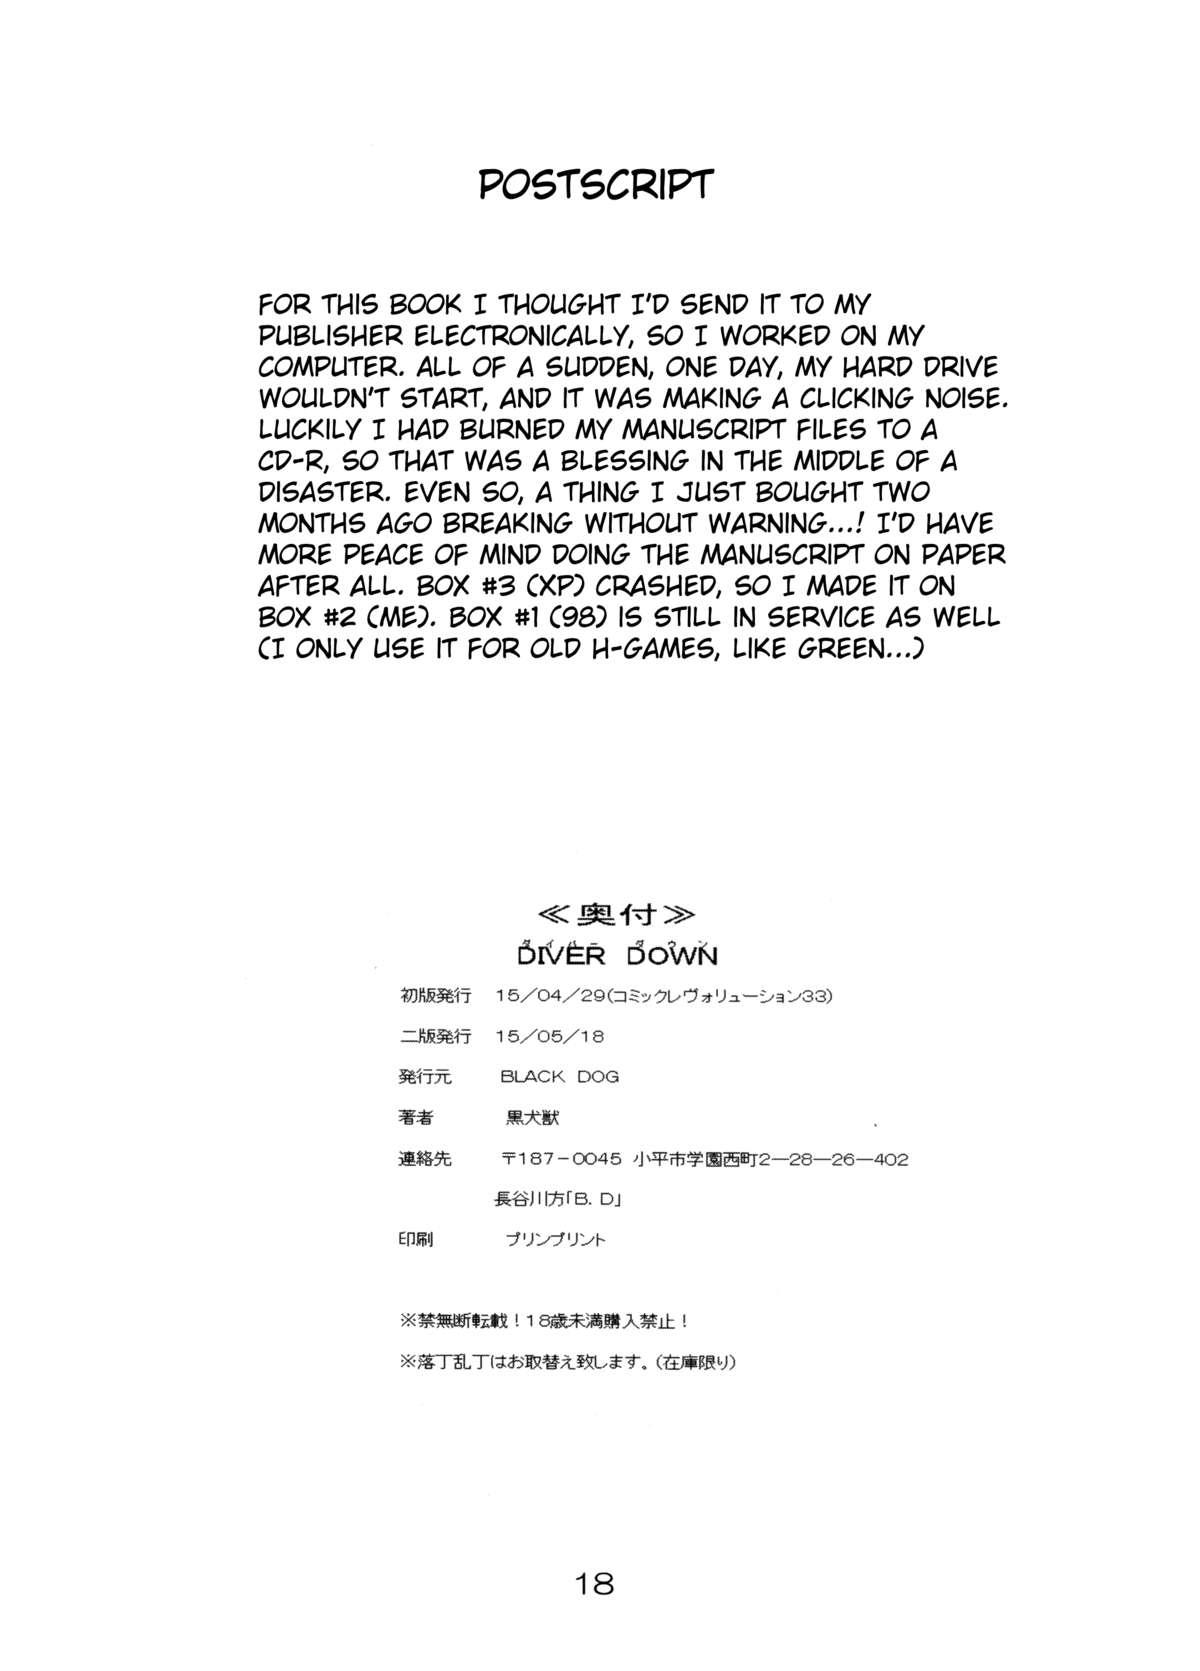 HentaiVN.net - Ảnh 17 - Diver Down (Bishoujo Senshi Sailor Moon) - Oneshot